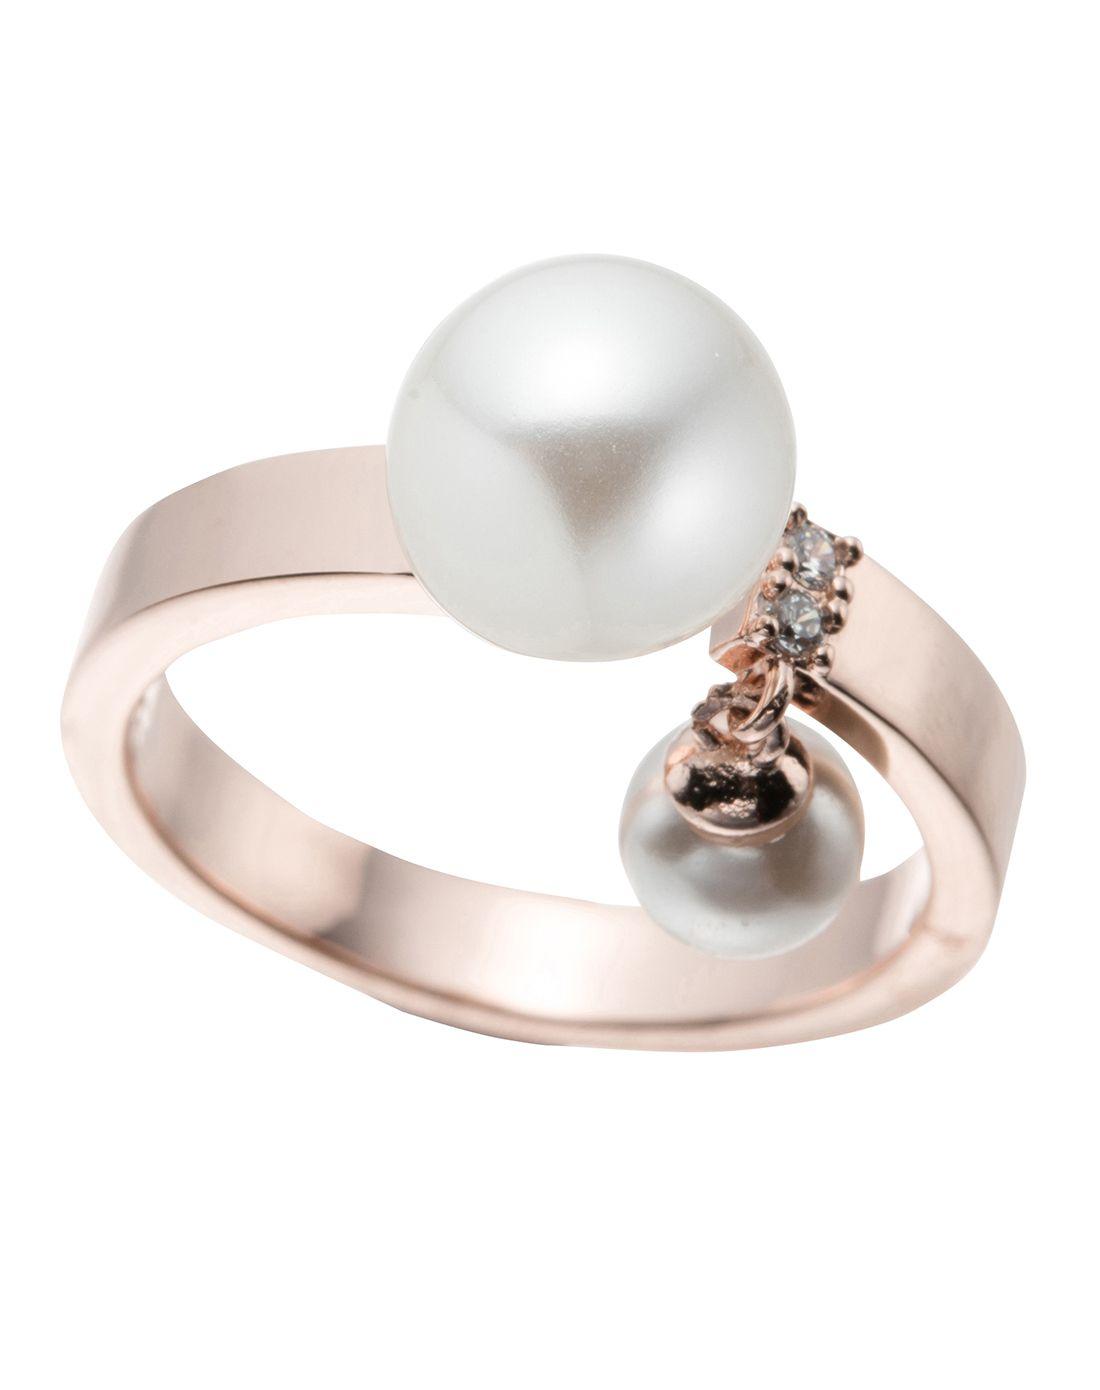 clue双珍珠戒指